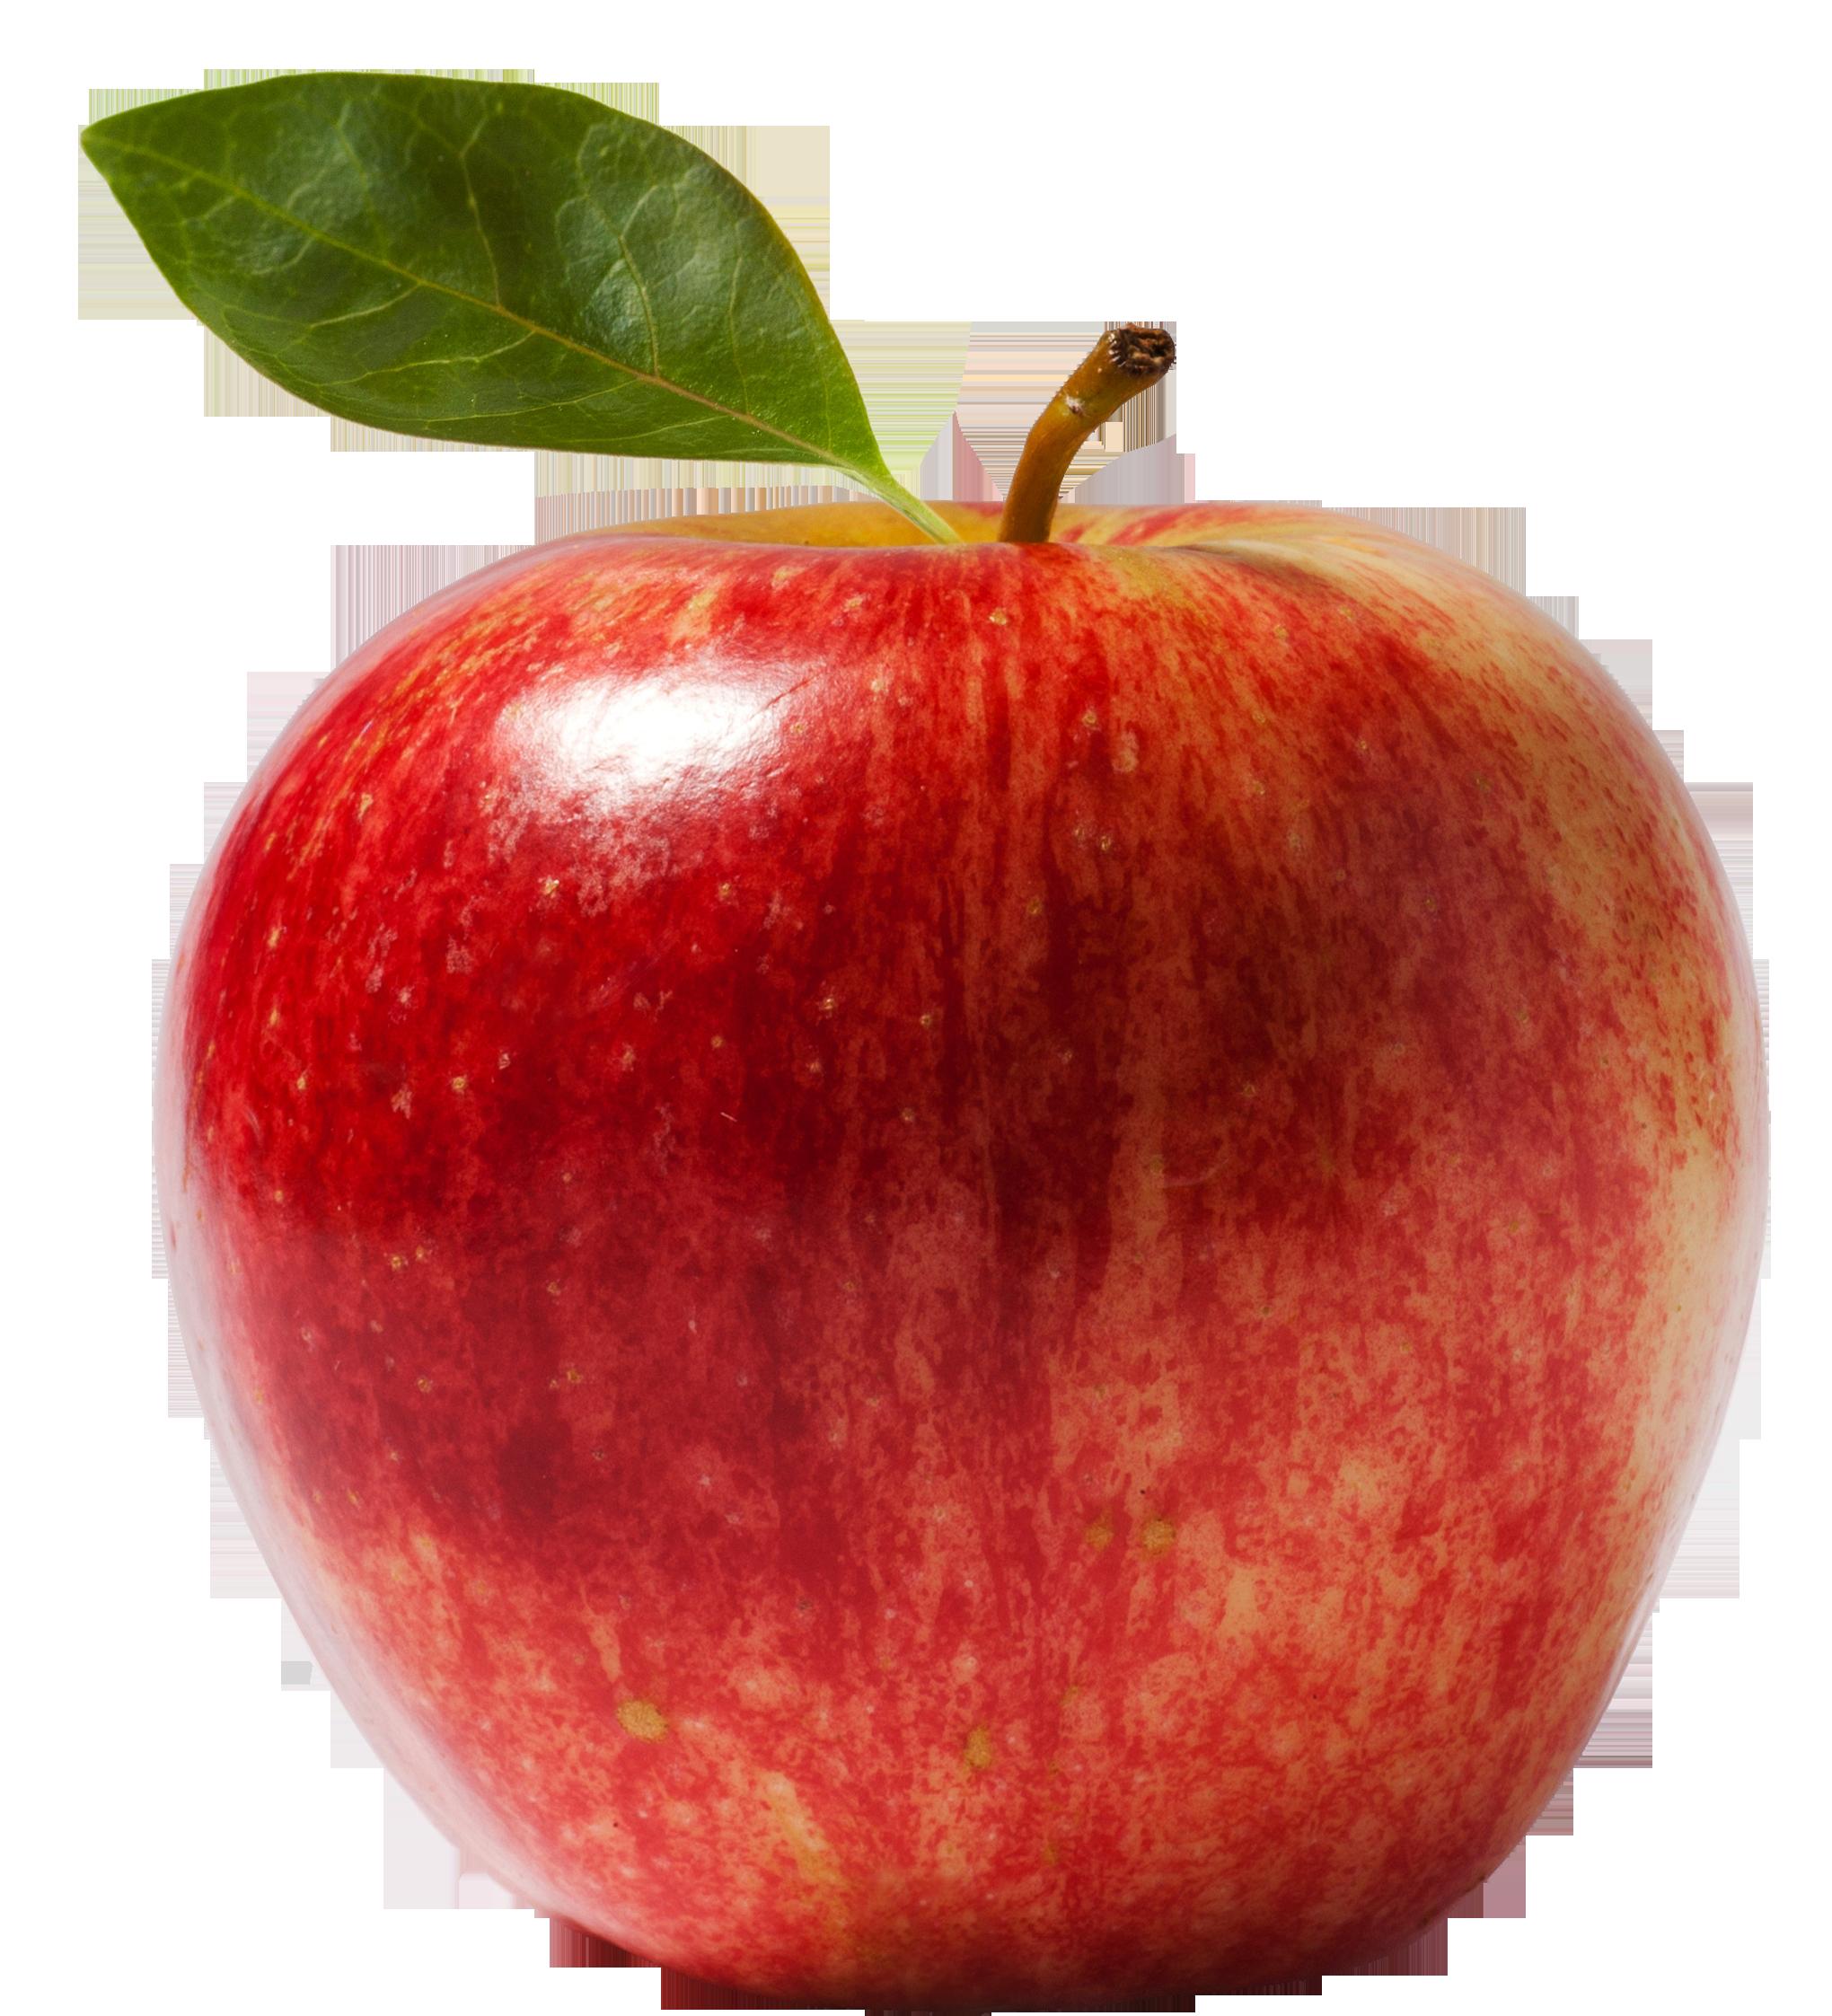 A Nemes Alma Vagy Hazi Alma Malus Domestica A Rozsaviraguak Rosales Rendjebe Es A Rozsafelek Rosaceae Csalad Watercolor Fruit Apple Picture Fruits Images